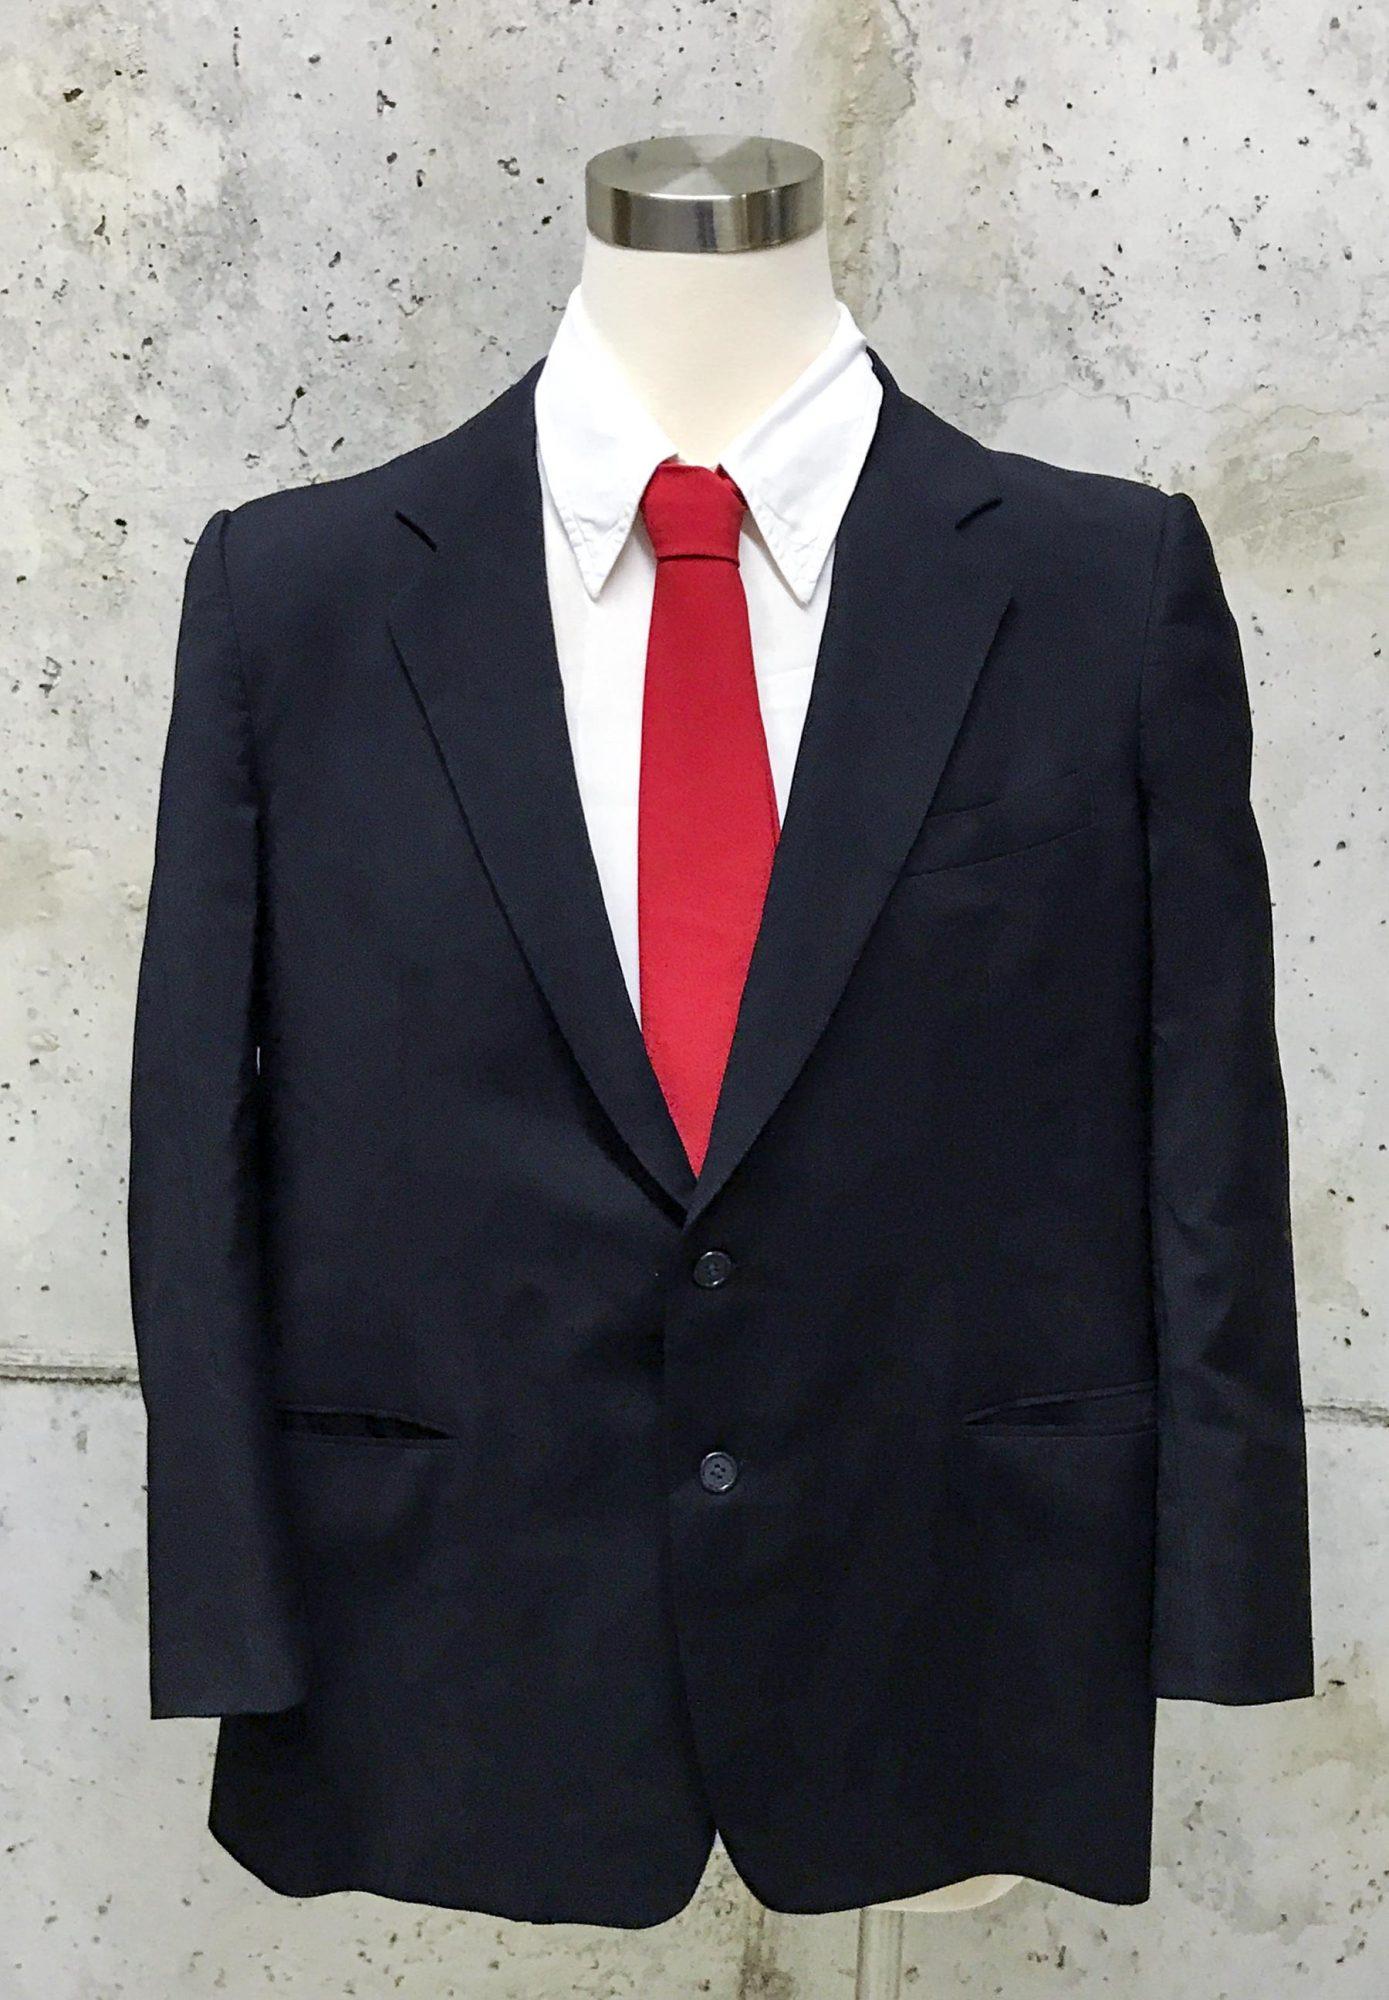 Rodney-Dangerfield-Shirt,-Coat-&-Tie